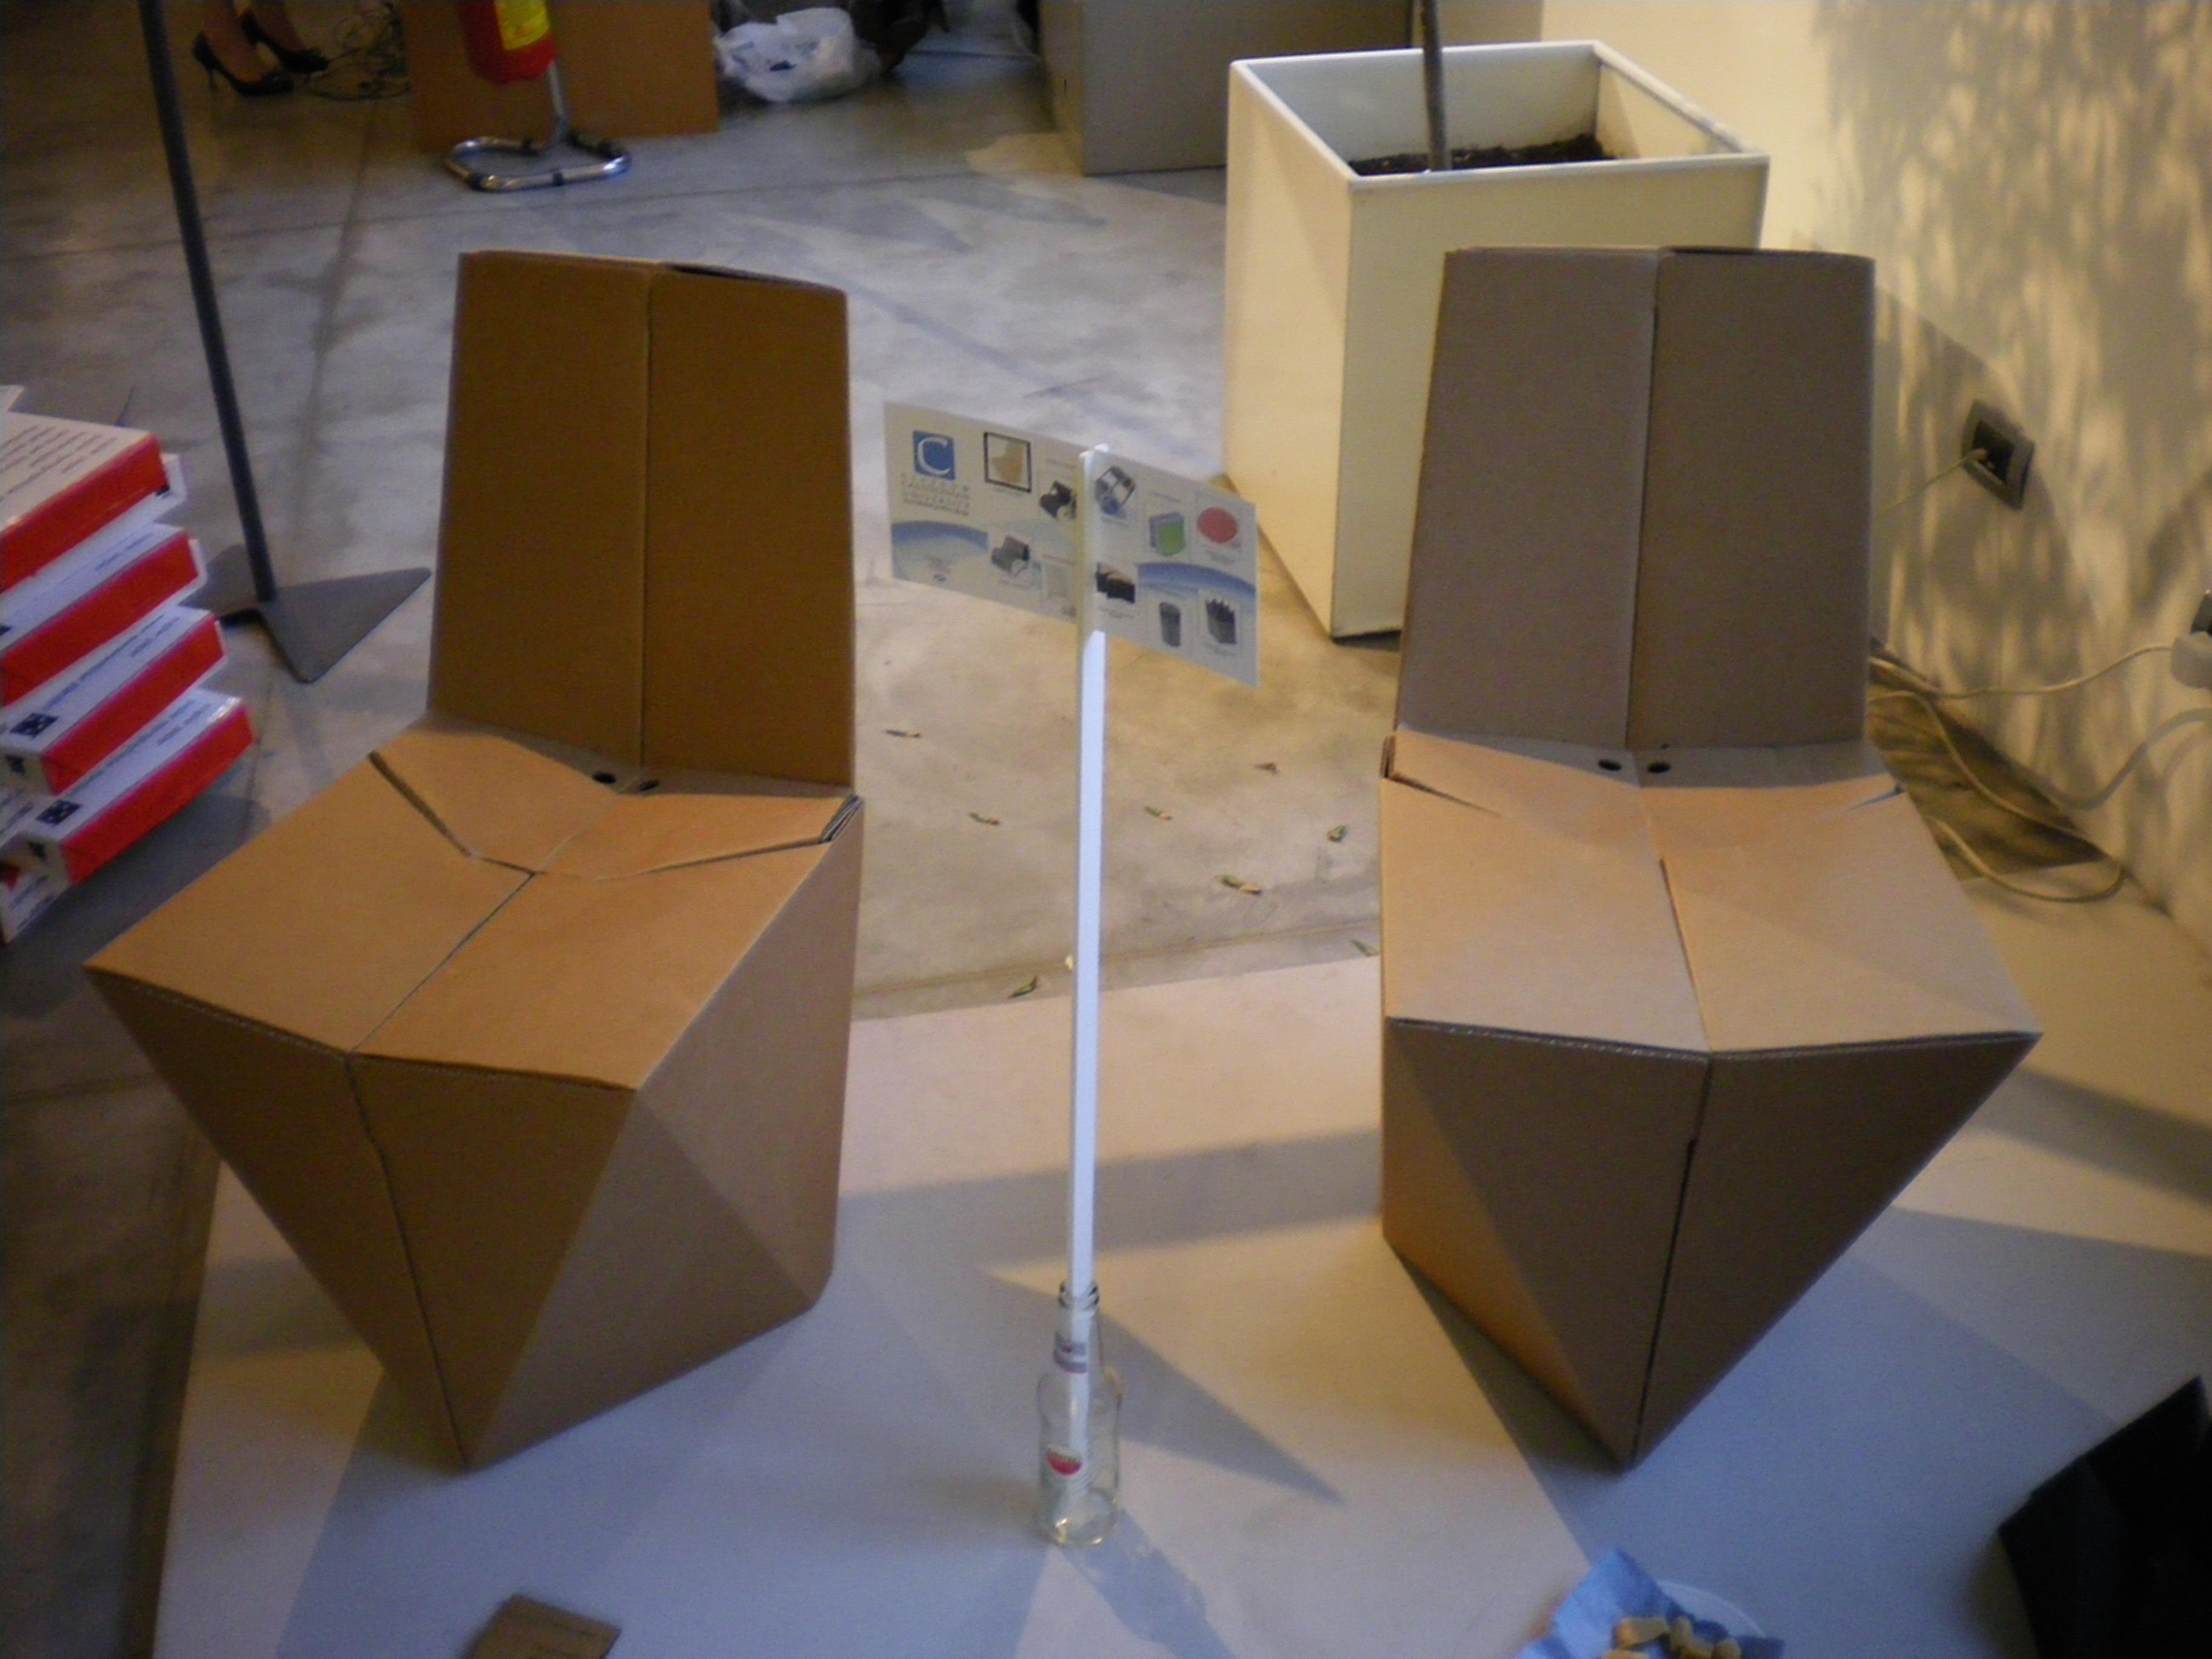 Foldable cardboard chair by Stuart Miller at deignersblock, Milan